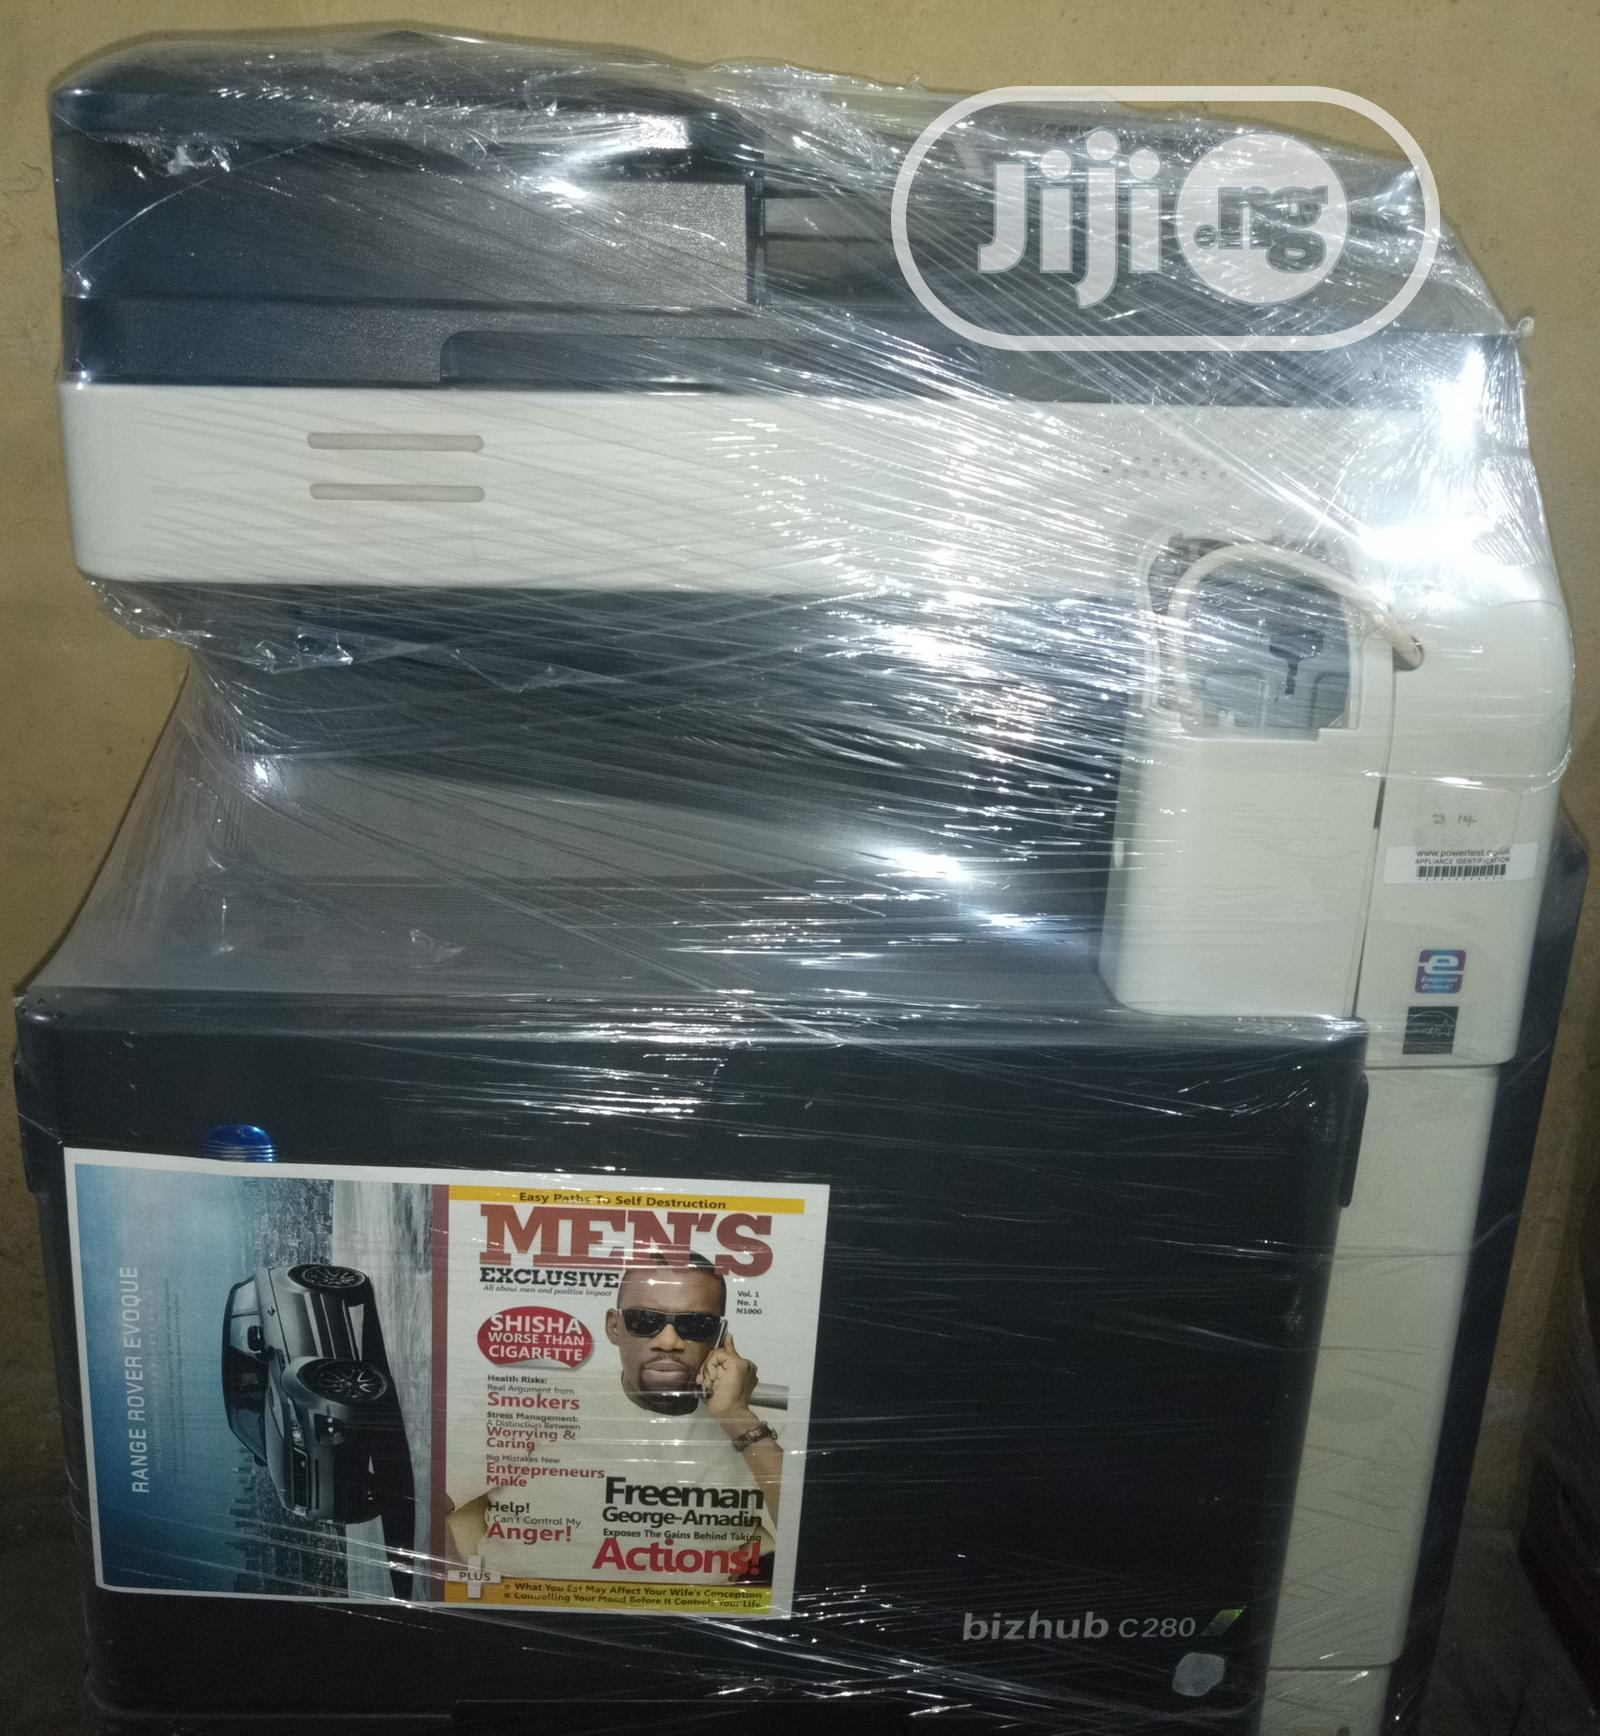 Konica Minolta Bizhub C280 Colour Multifunctional Printer   Printers & Scanners for sale in Surulere, Lagos State, Nigeria